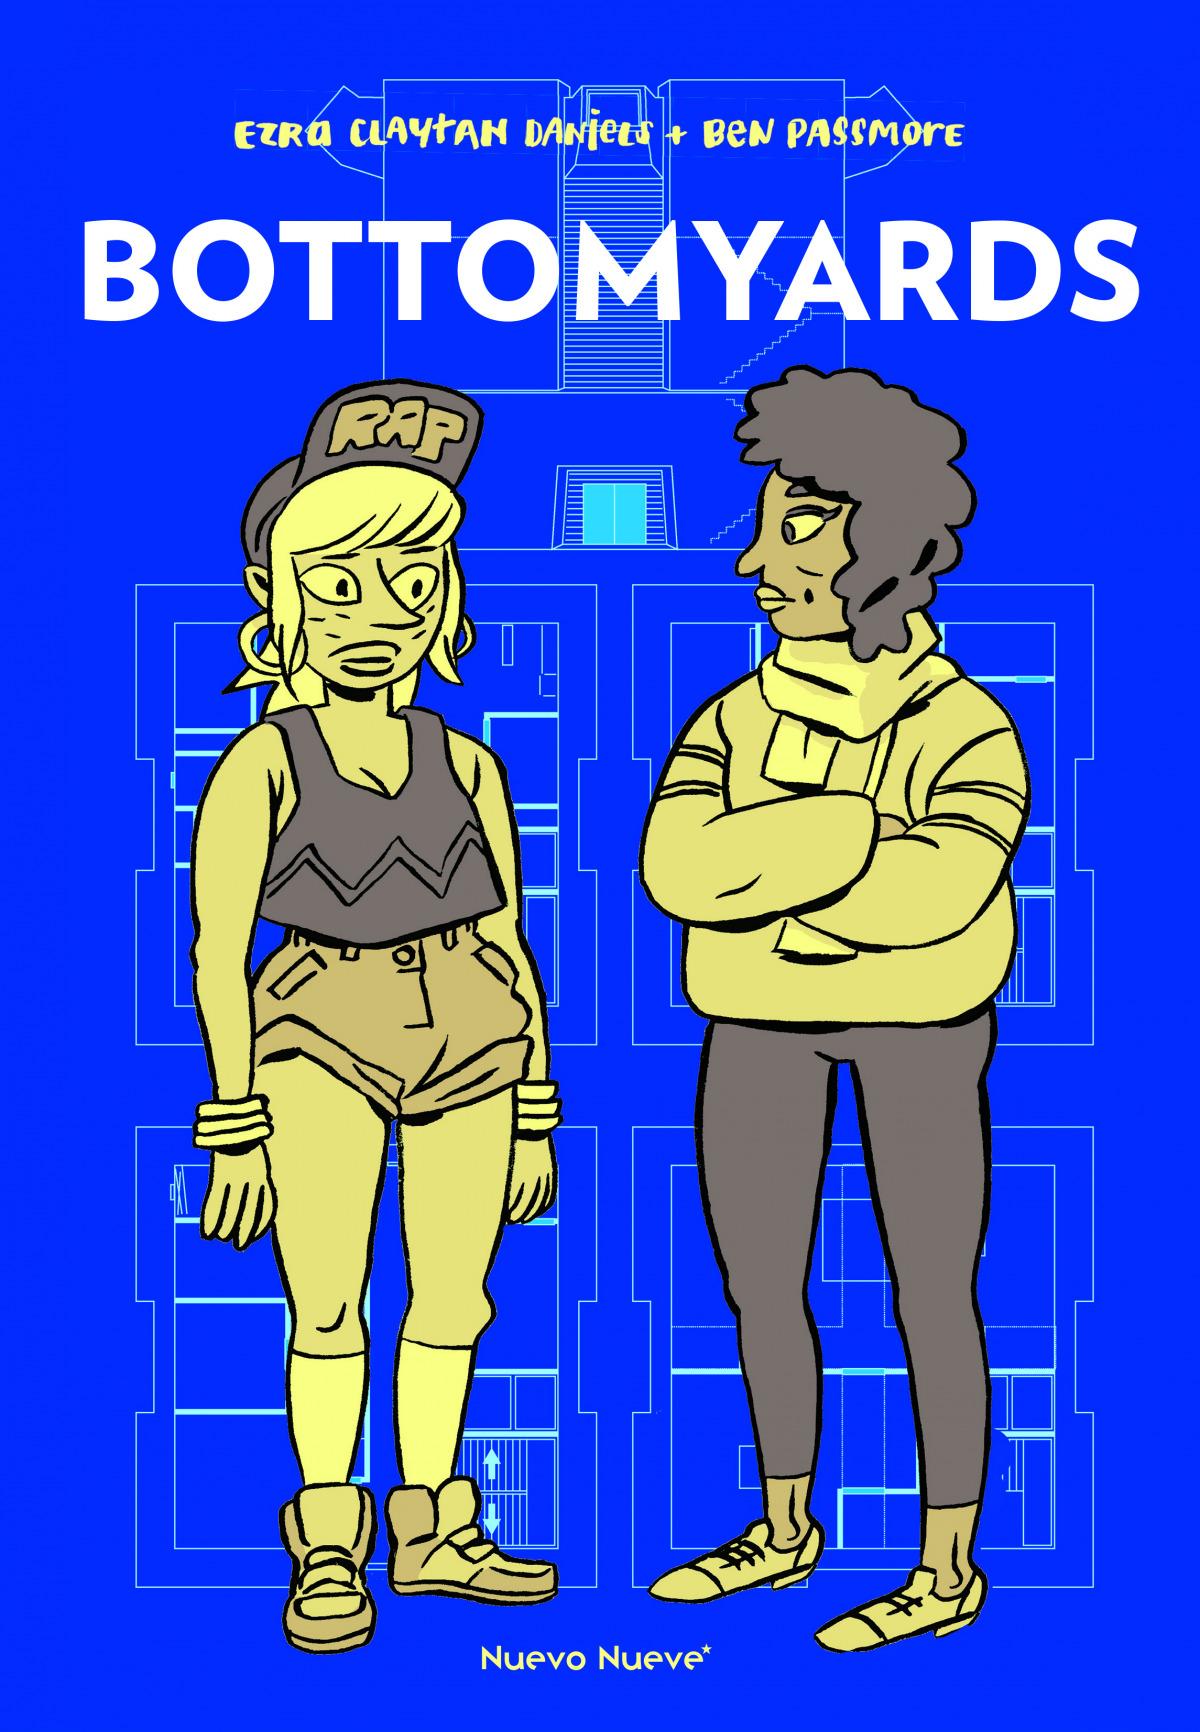 Bottomyard